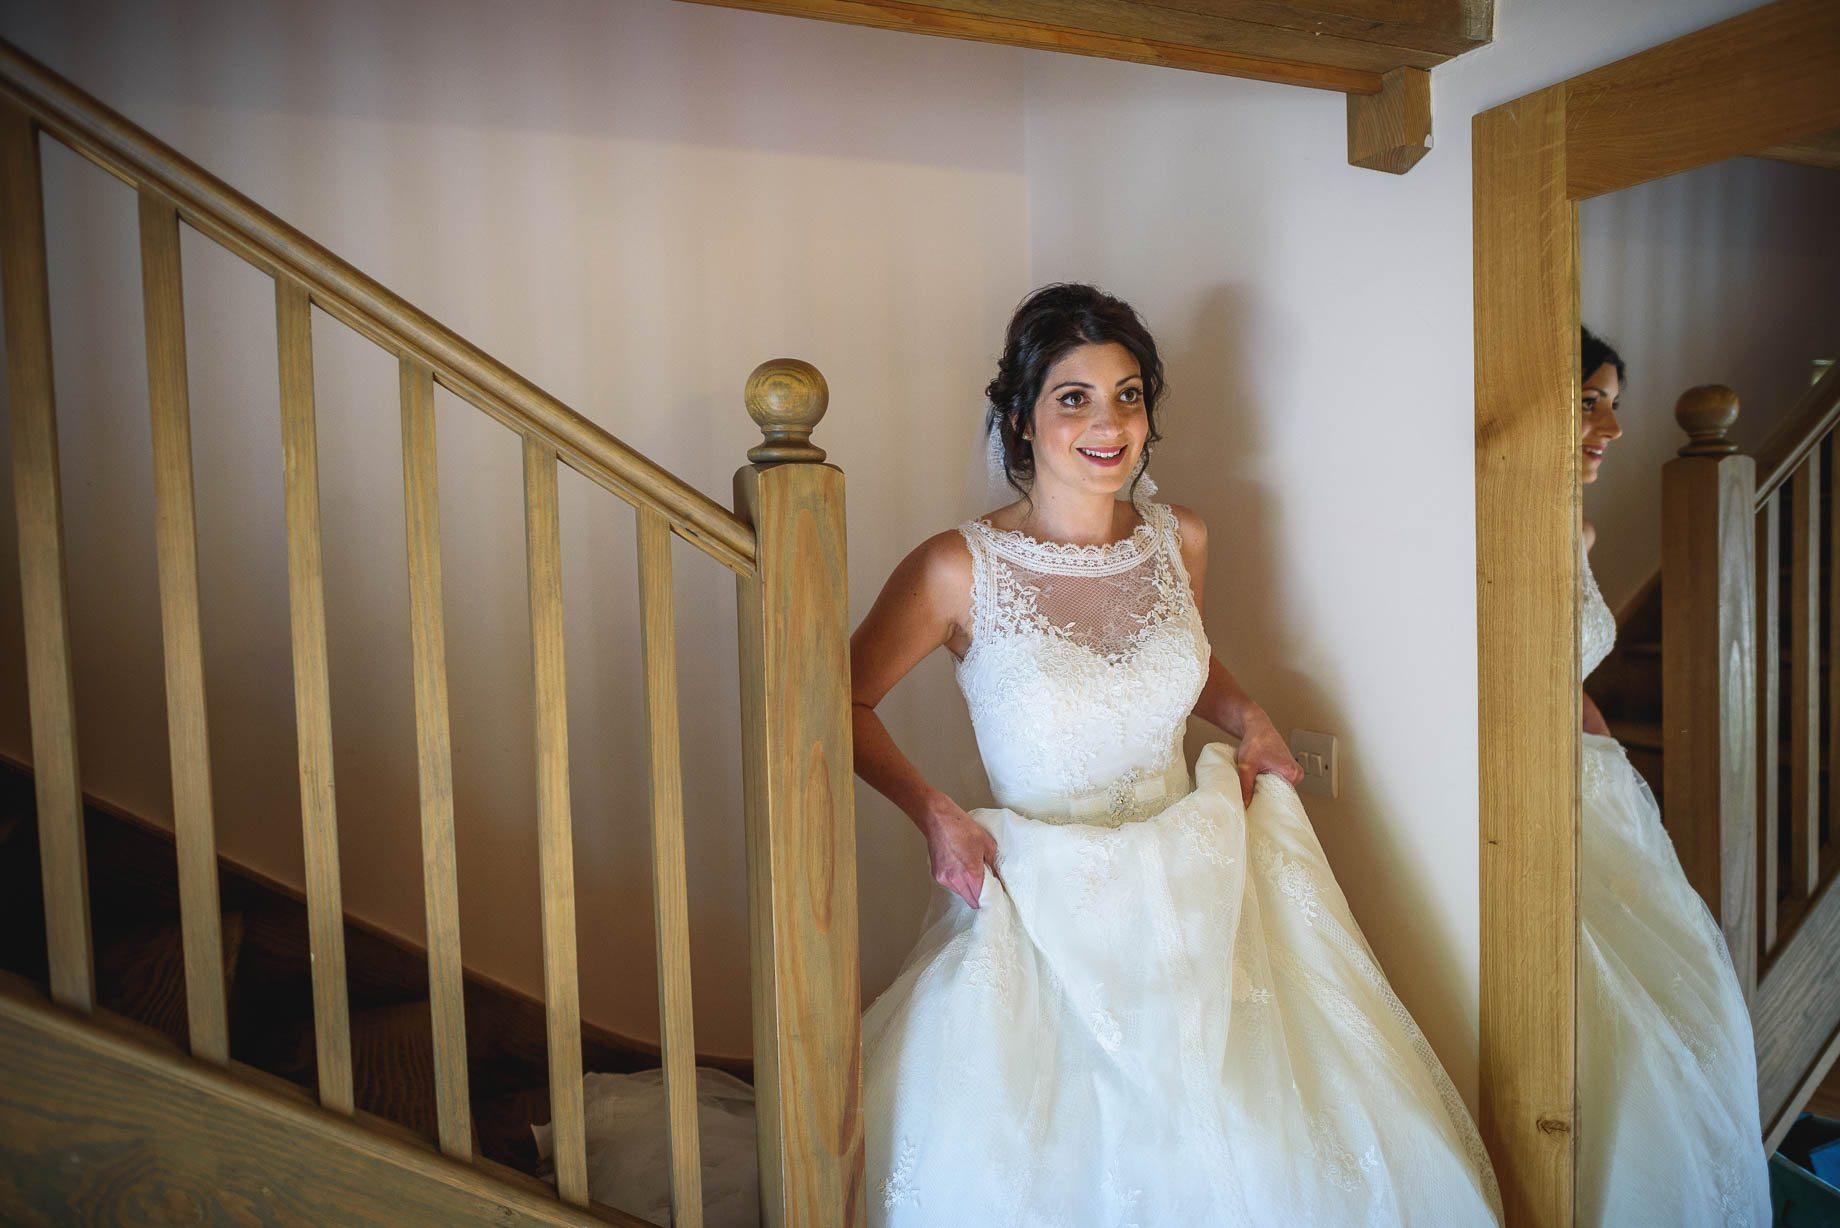 Gaynes Park wedding photography - Guy Collier Photography - Rachel and Jon (51 of 169)